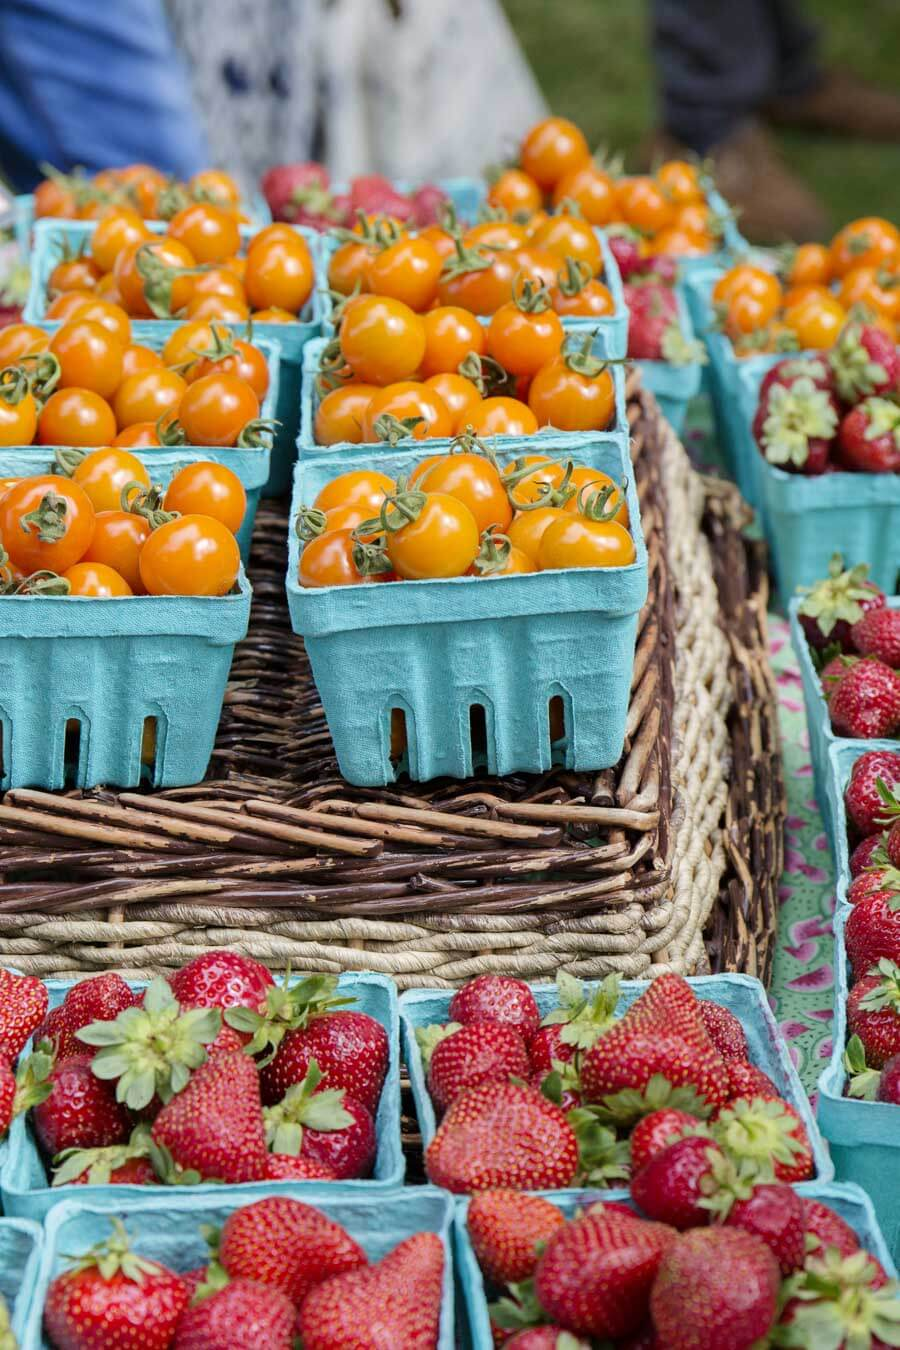 Tomatos and strawberries